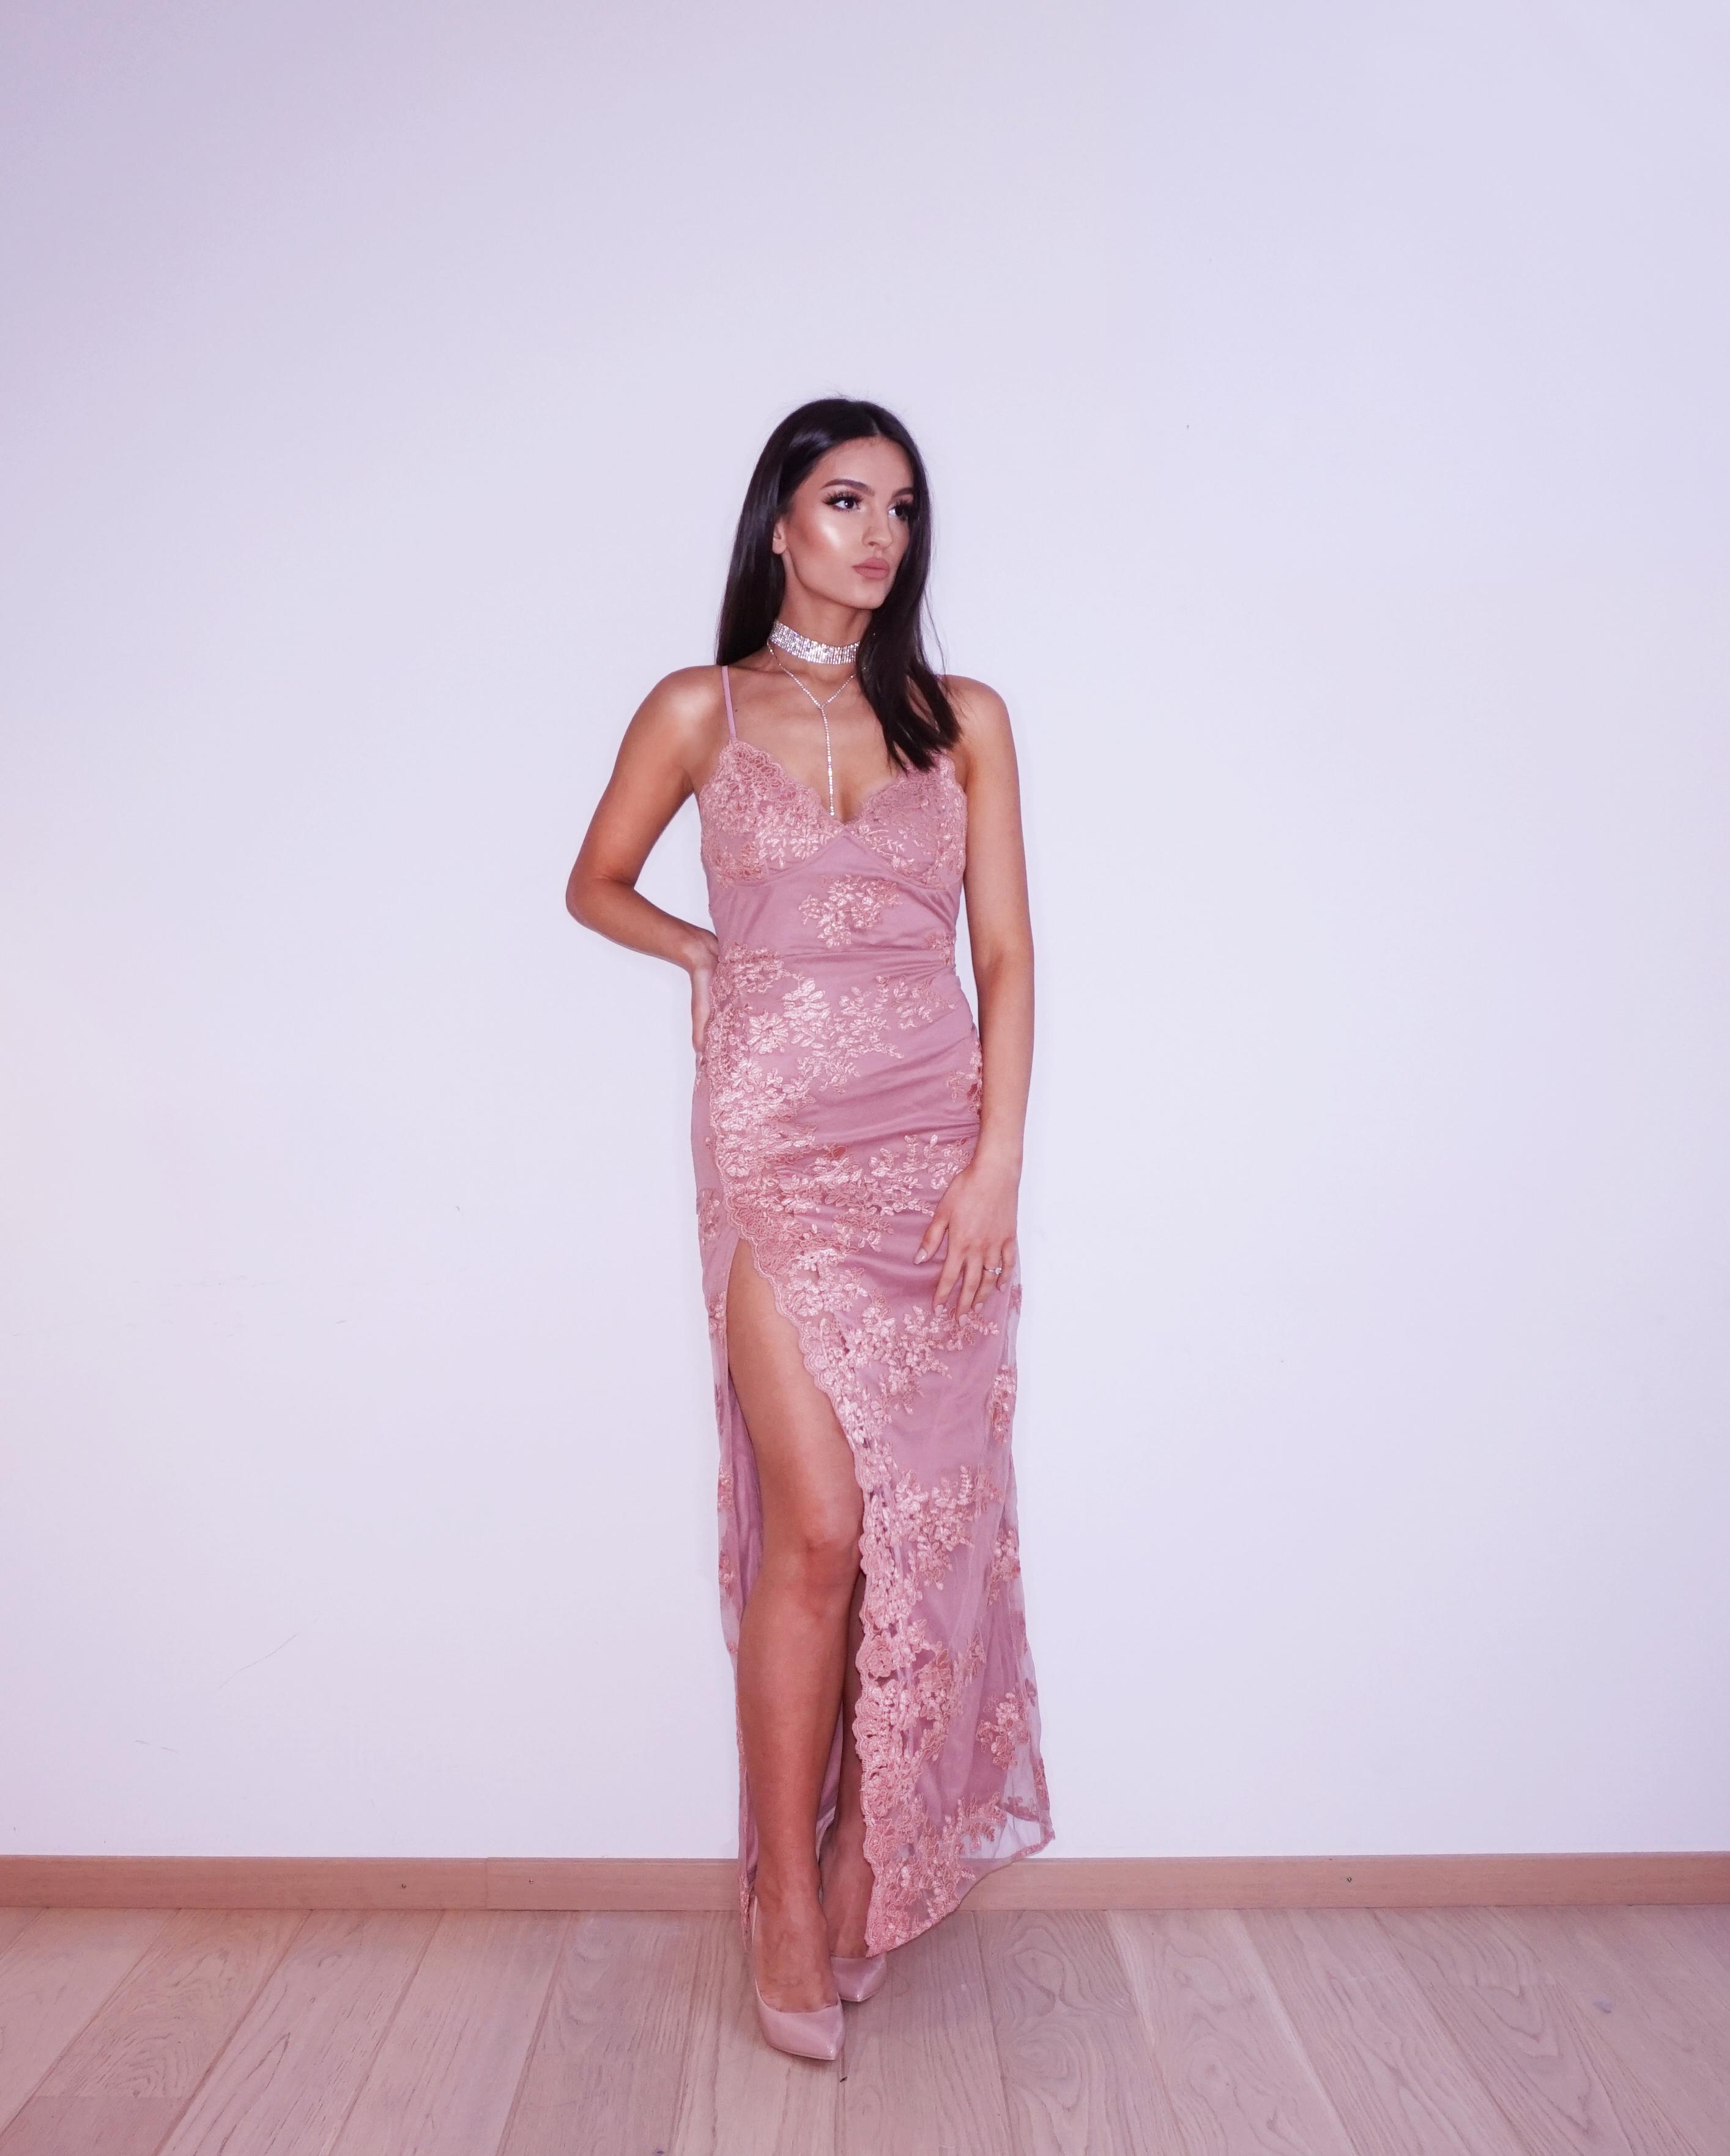 e53e5239ee8 A Night In Tokyo Lace Dress - Mauve - FashionNova - Dresses - Your Vanity